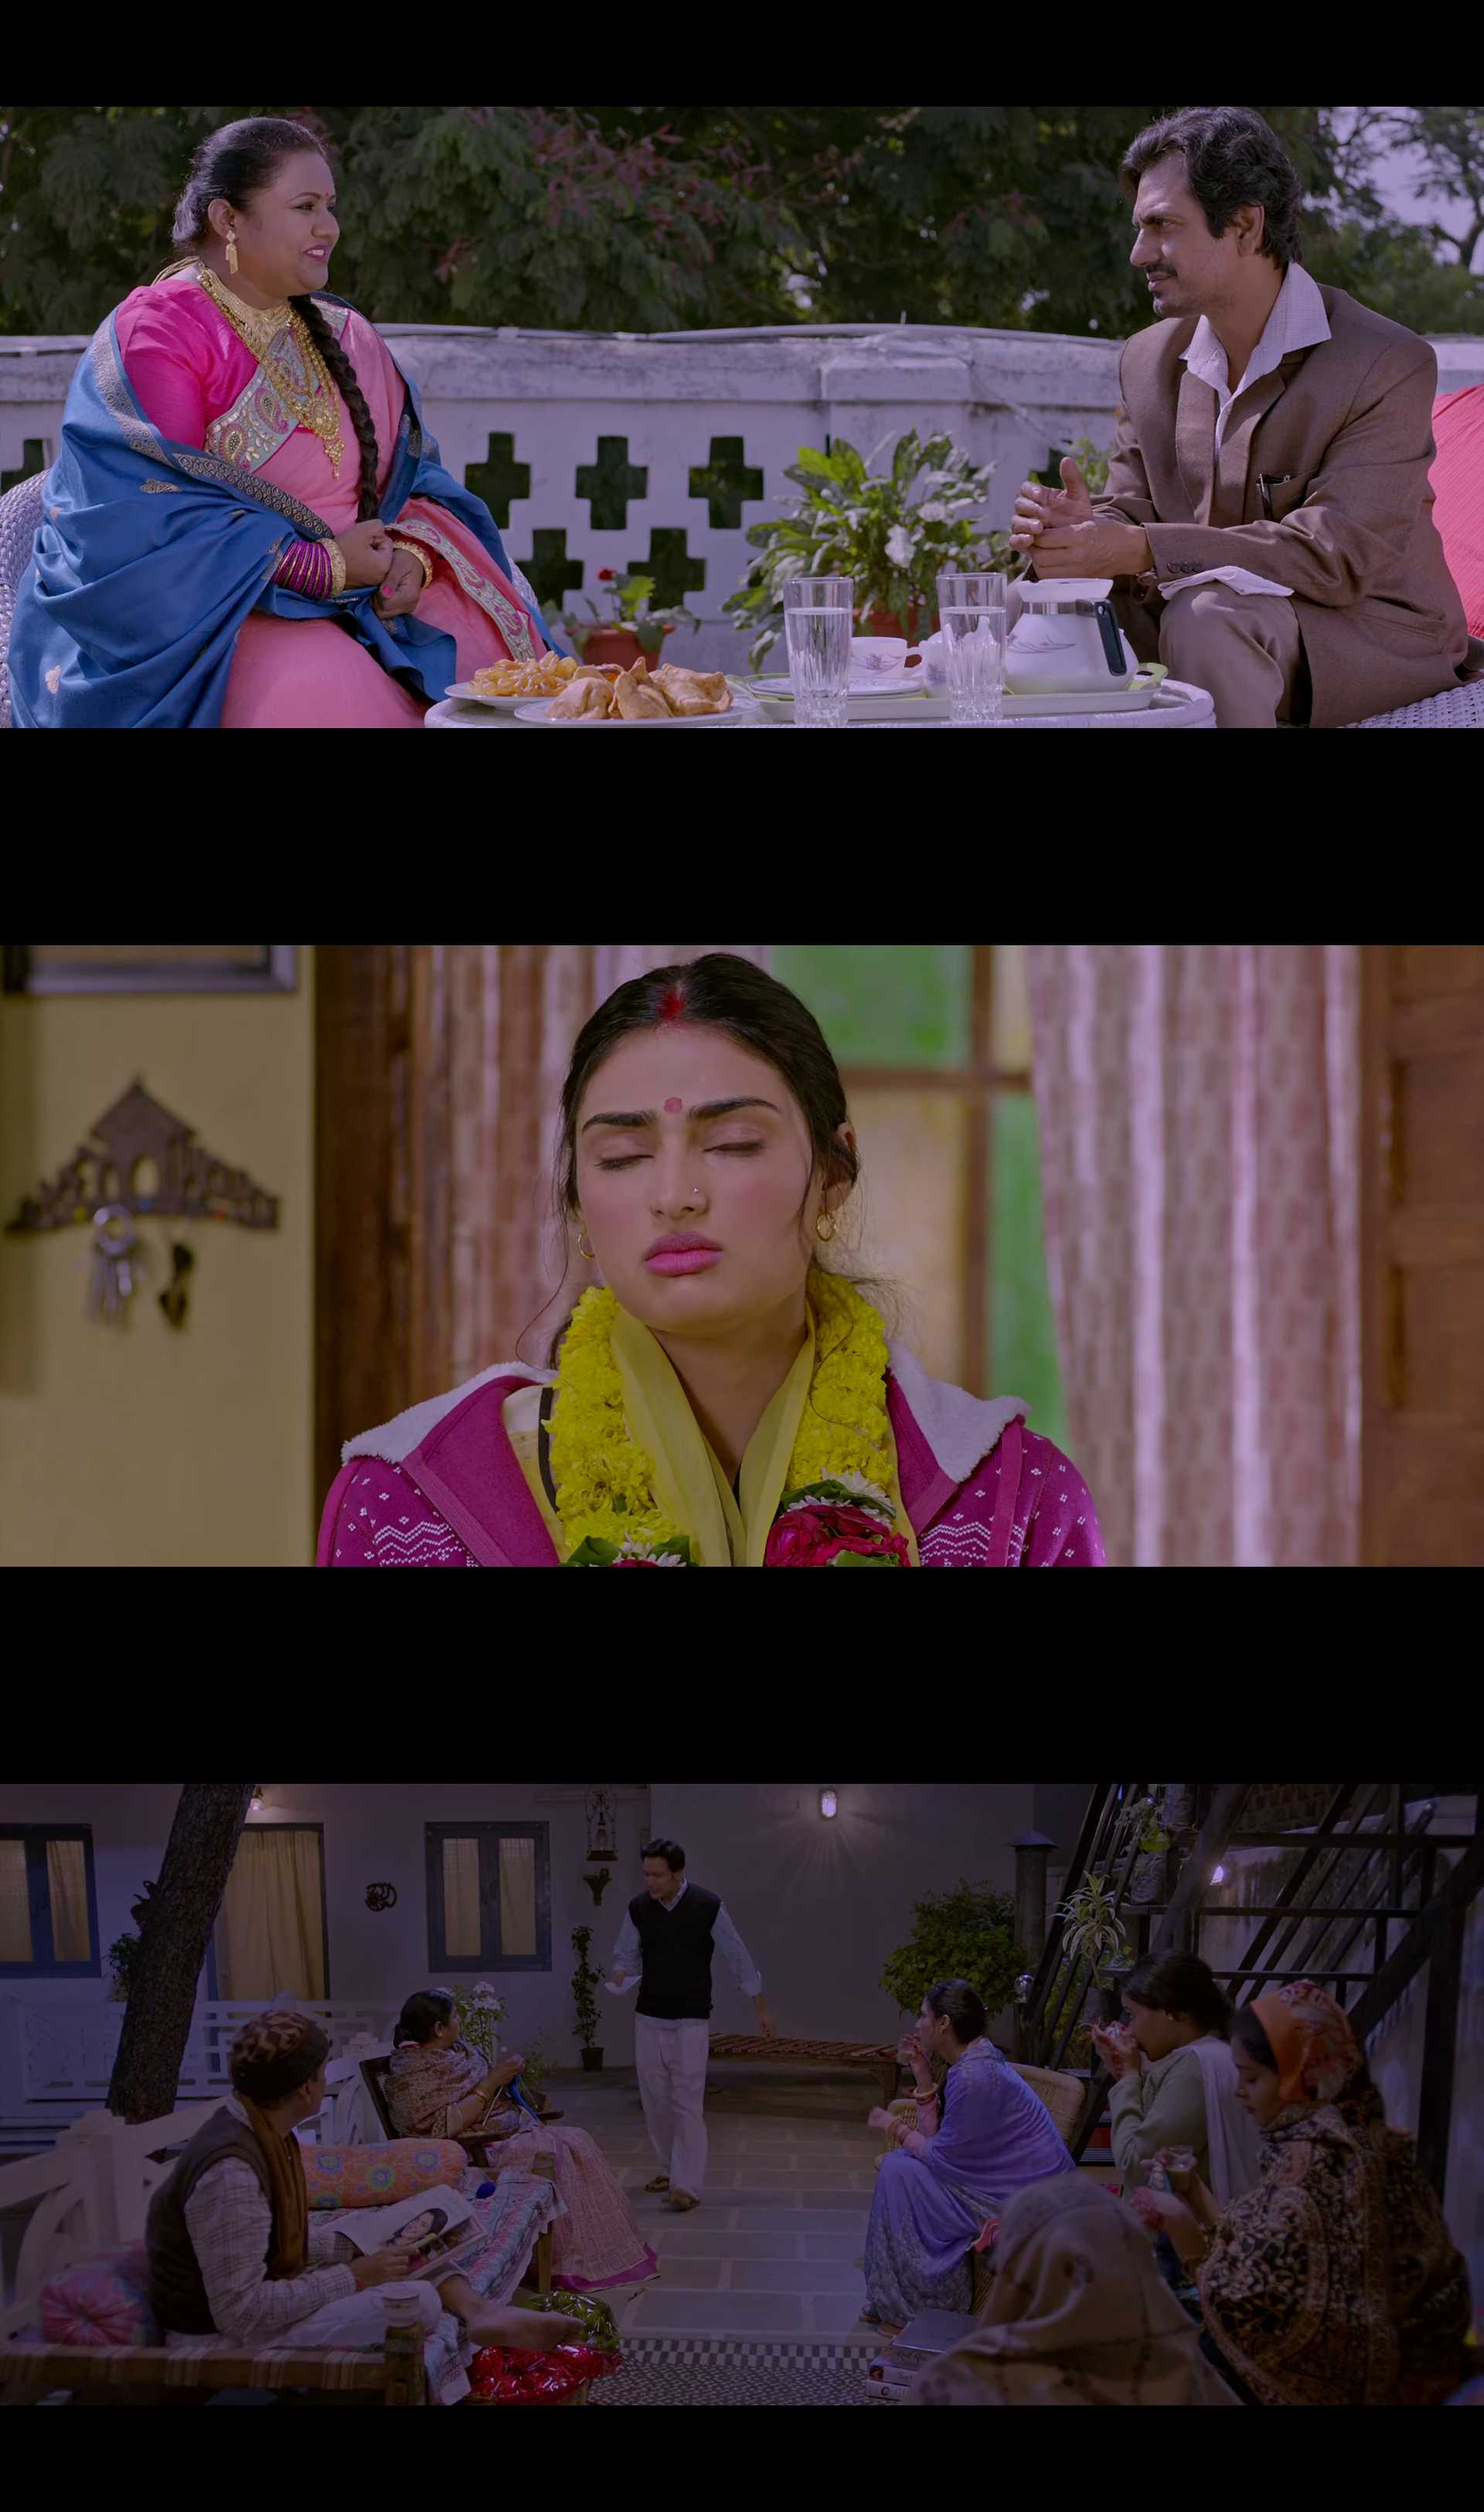 Screenshot of Motichoor Chaknachoor Movie